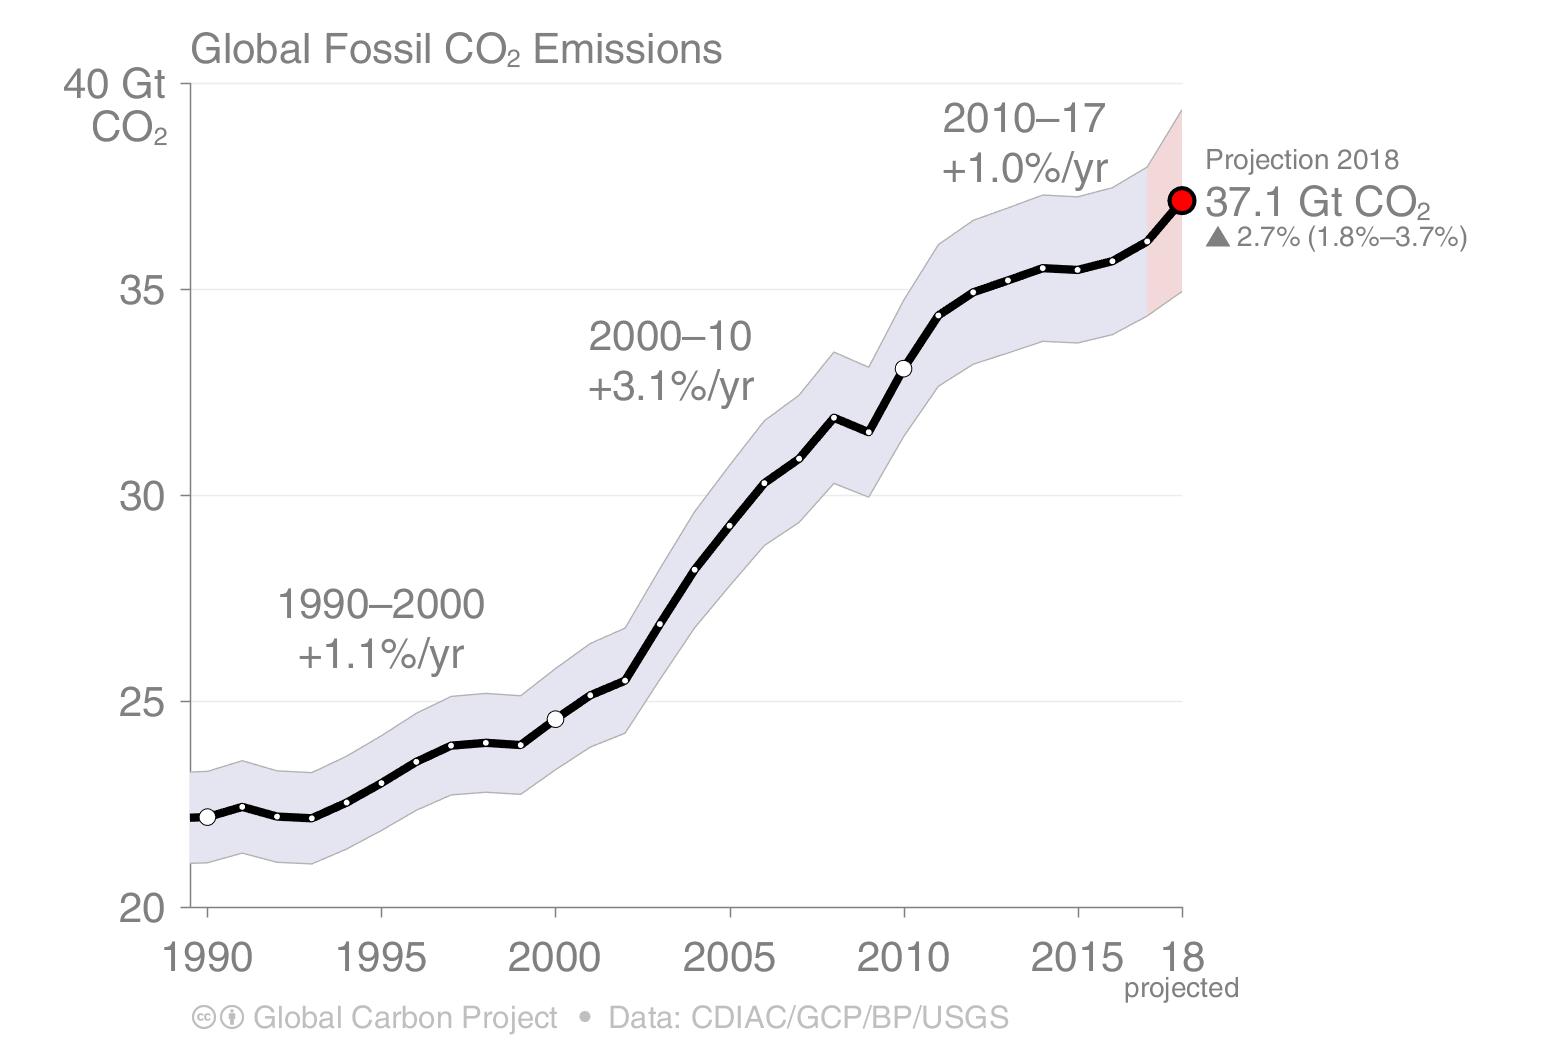 Global fossil CO2 Emissions